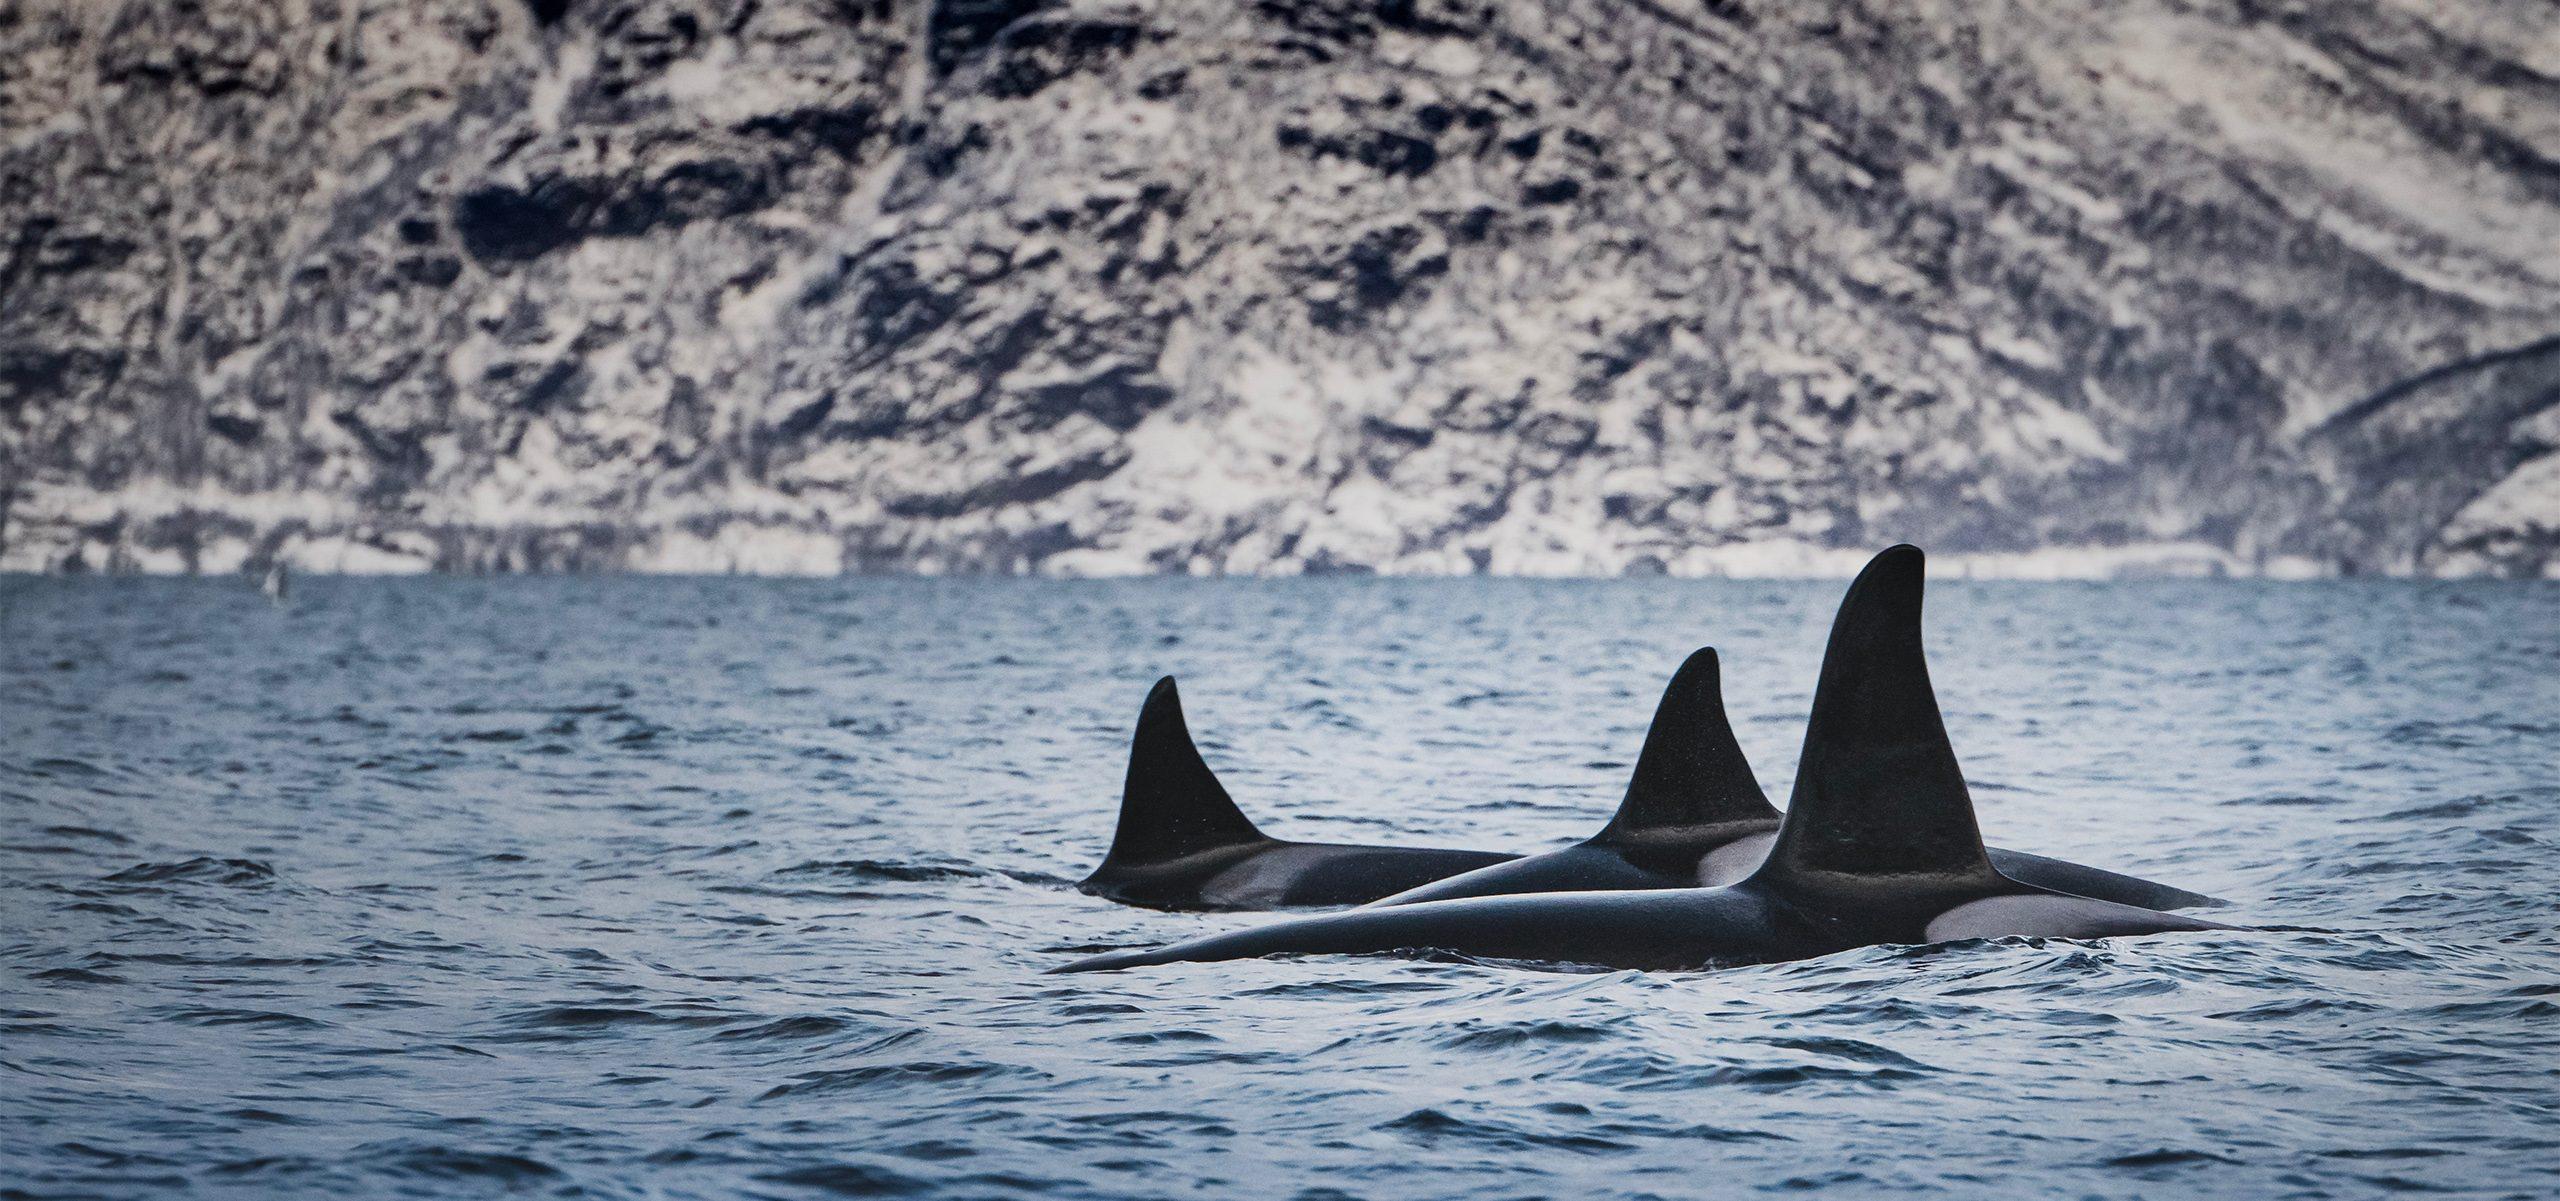 Norway - Orcas